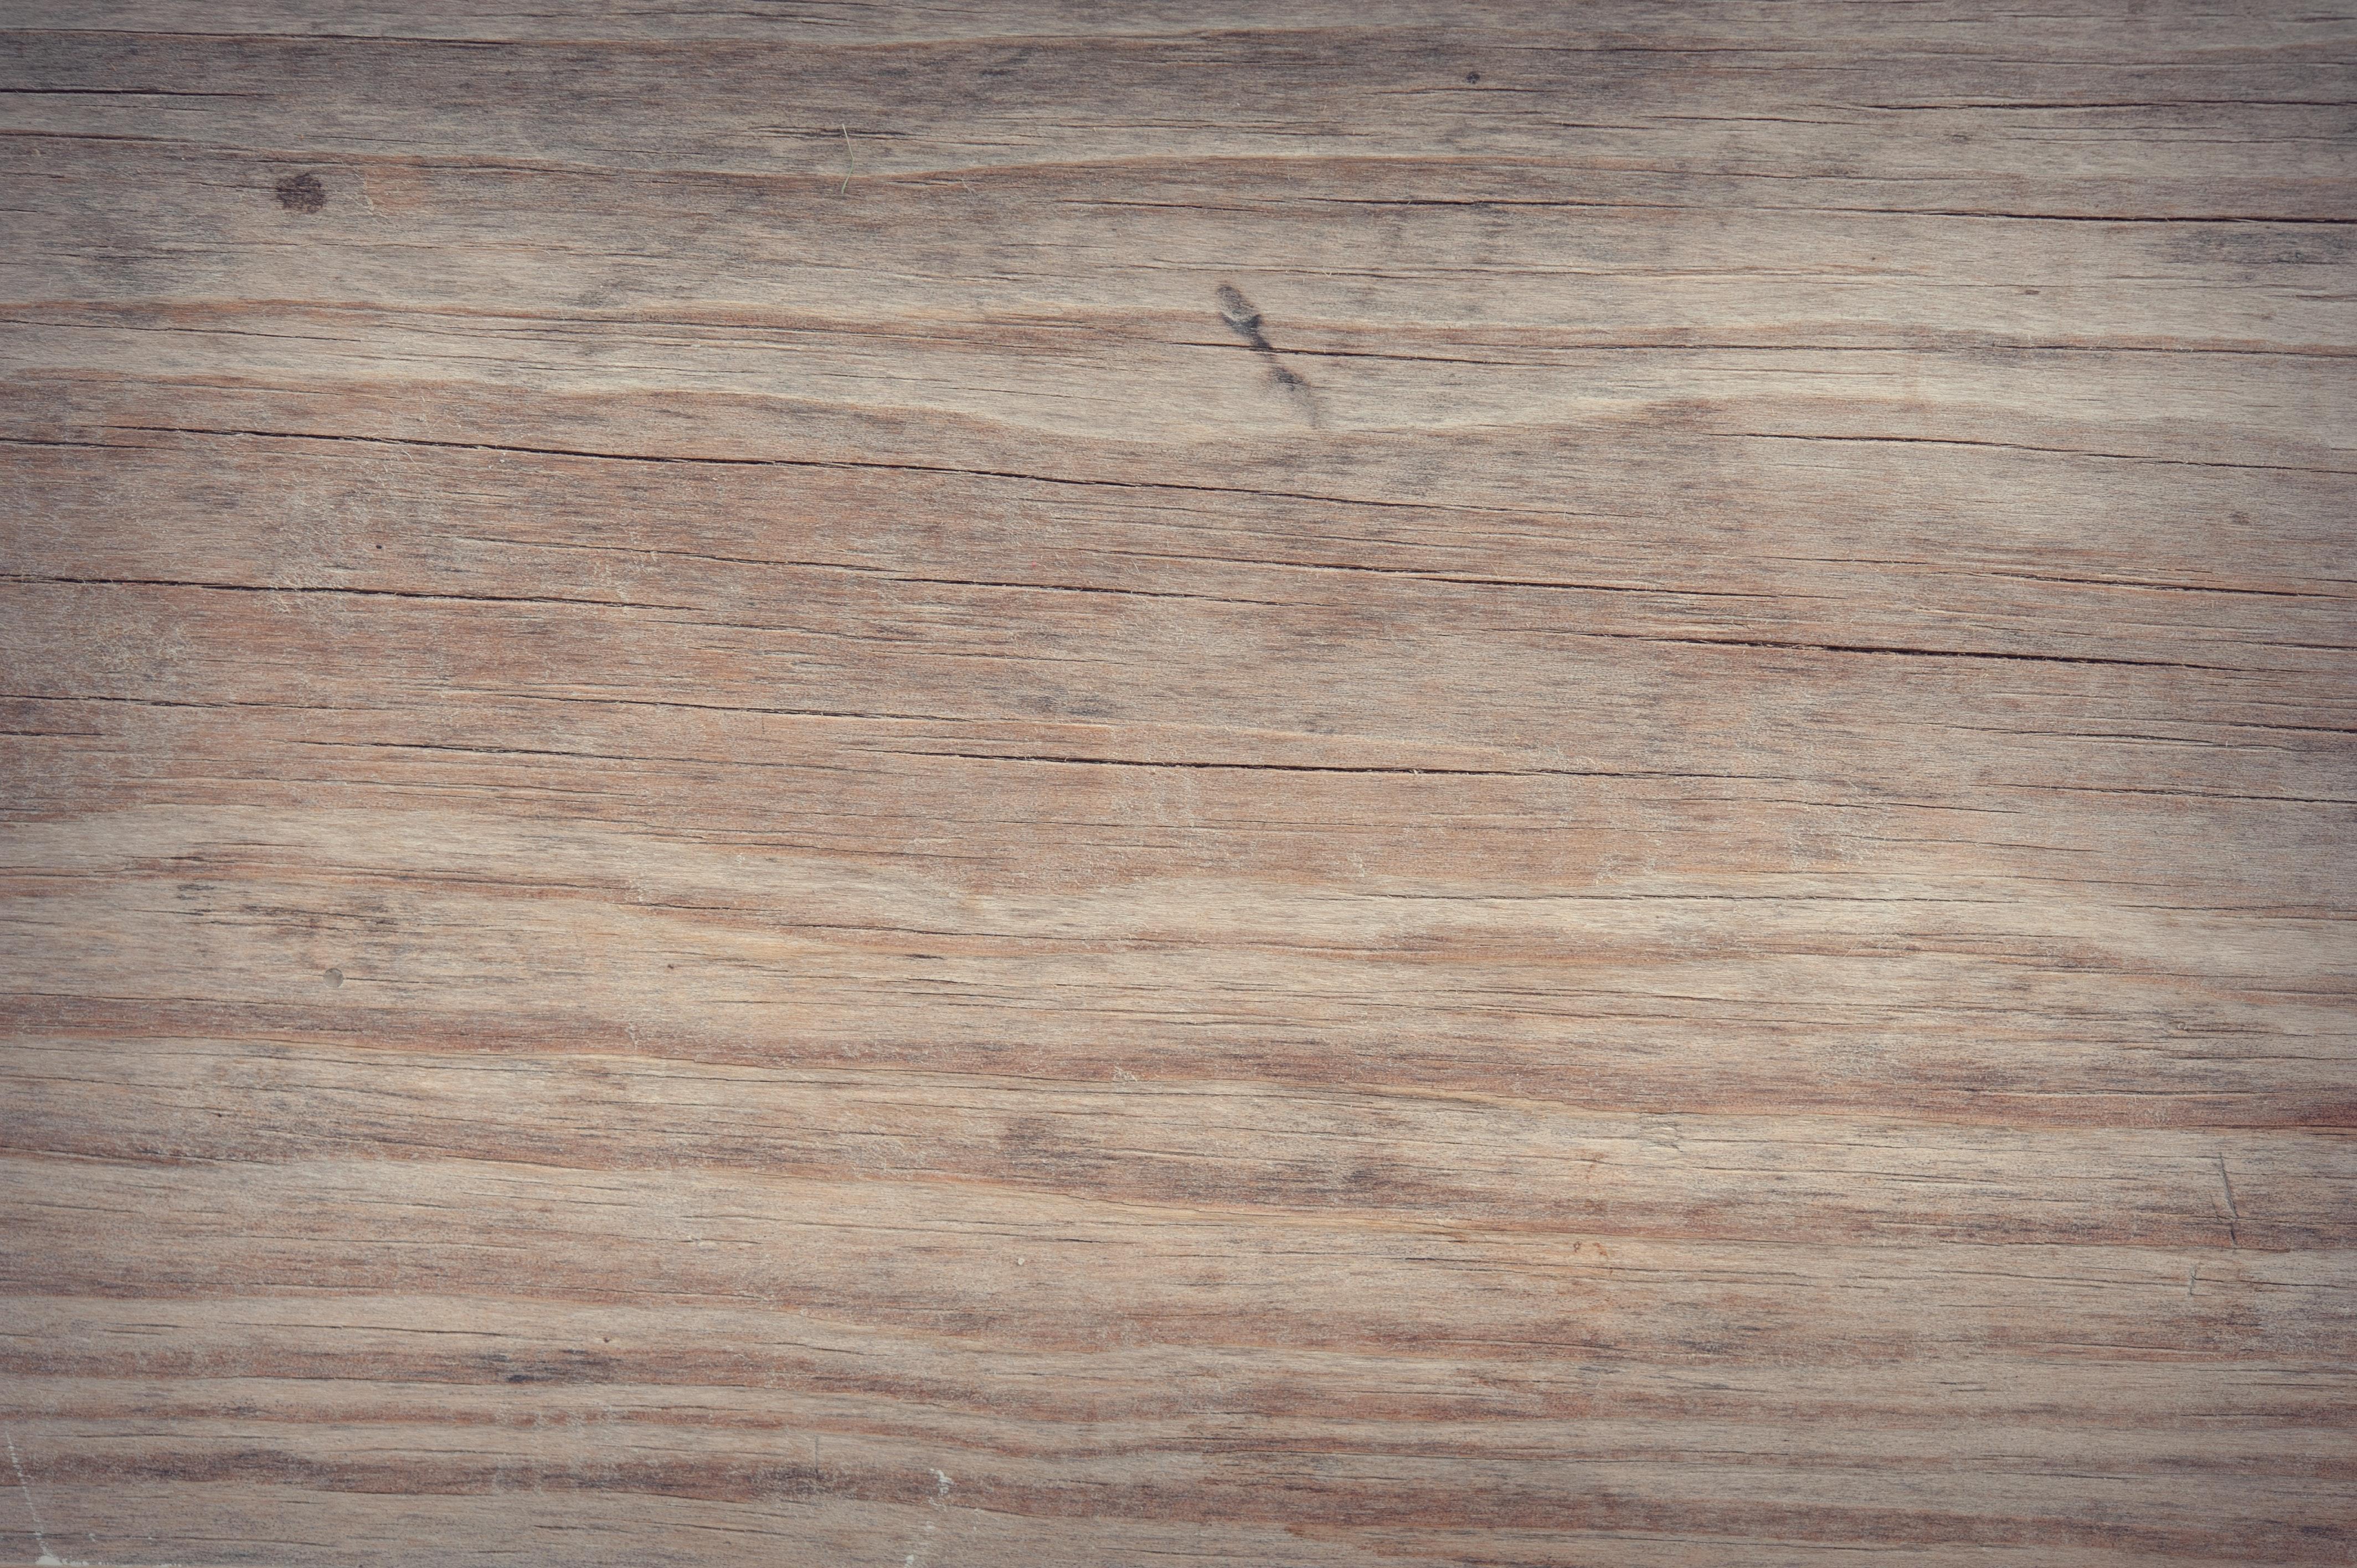 1000 Amazing Wooden Table Photos 183 Pexels 183 Free Stock Photos